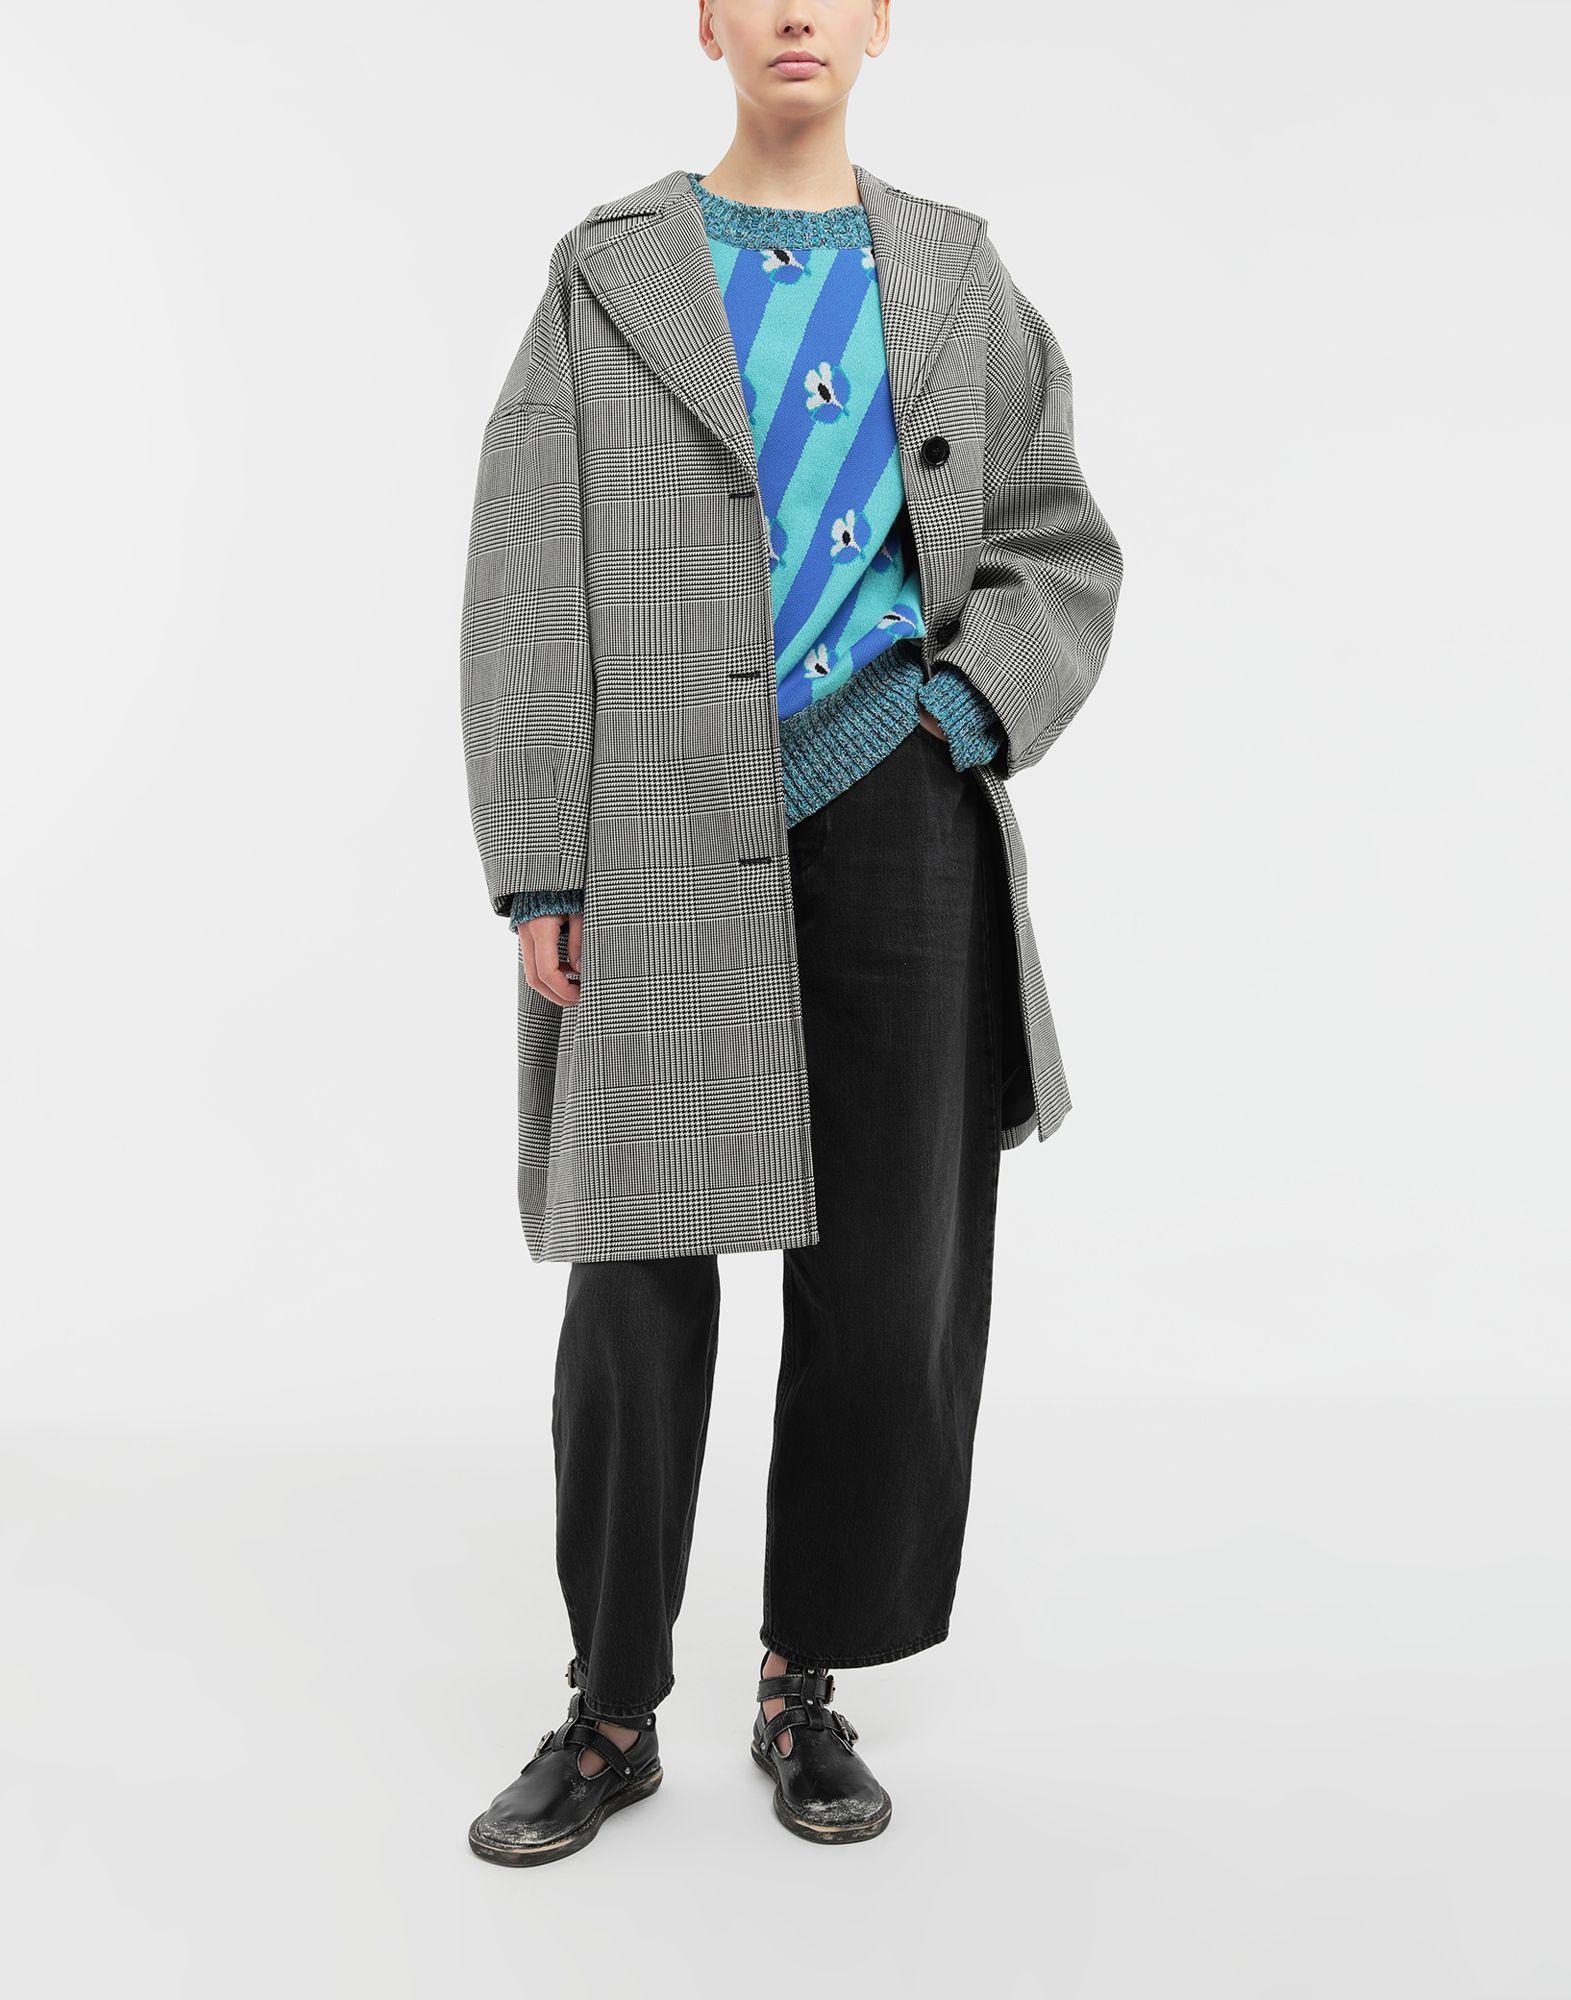 MM6 MAISON MARGIELA Oversized checked coat Coat Woman d